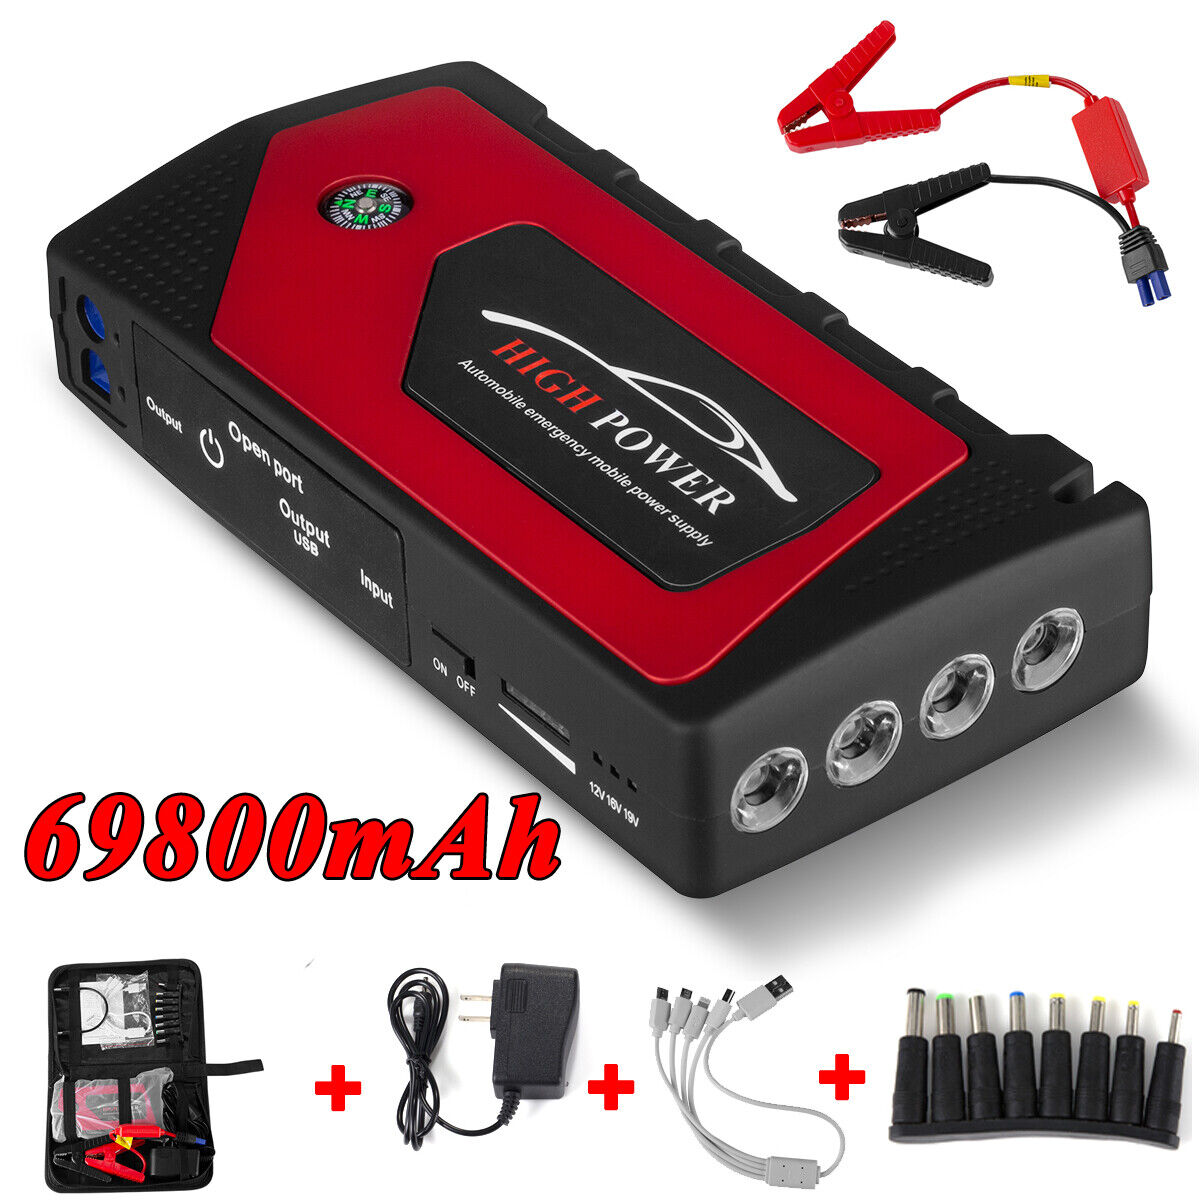 Car Jump Starter, 69800mAh USB Power Bank LED Flashlight 12V Battery Charger USA